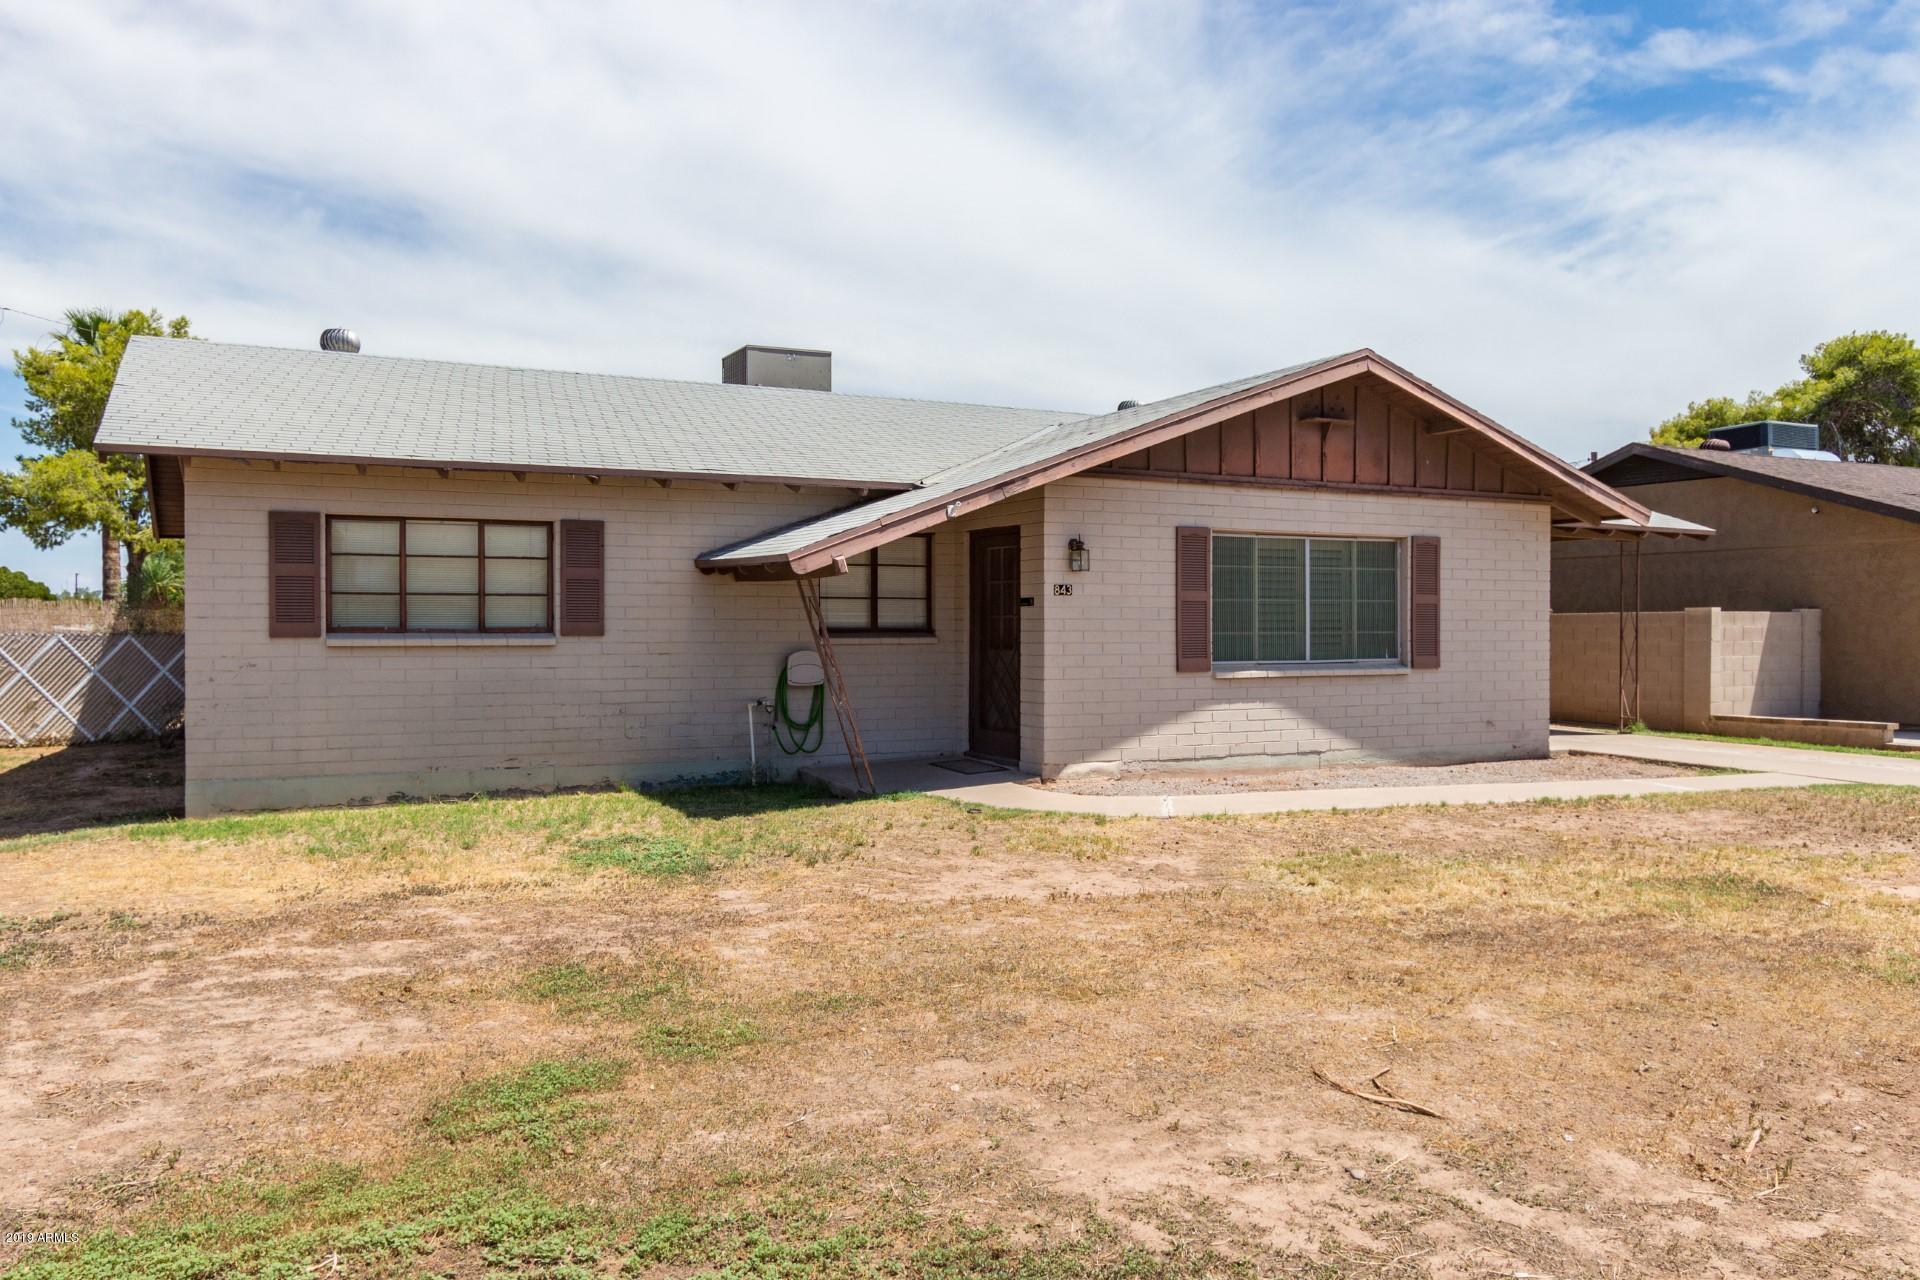 Photo of 843 N CHERI LYNN Drive, Chandler, AZ 85225